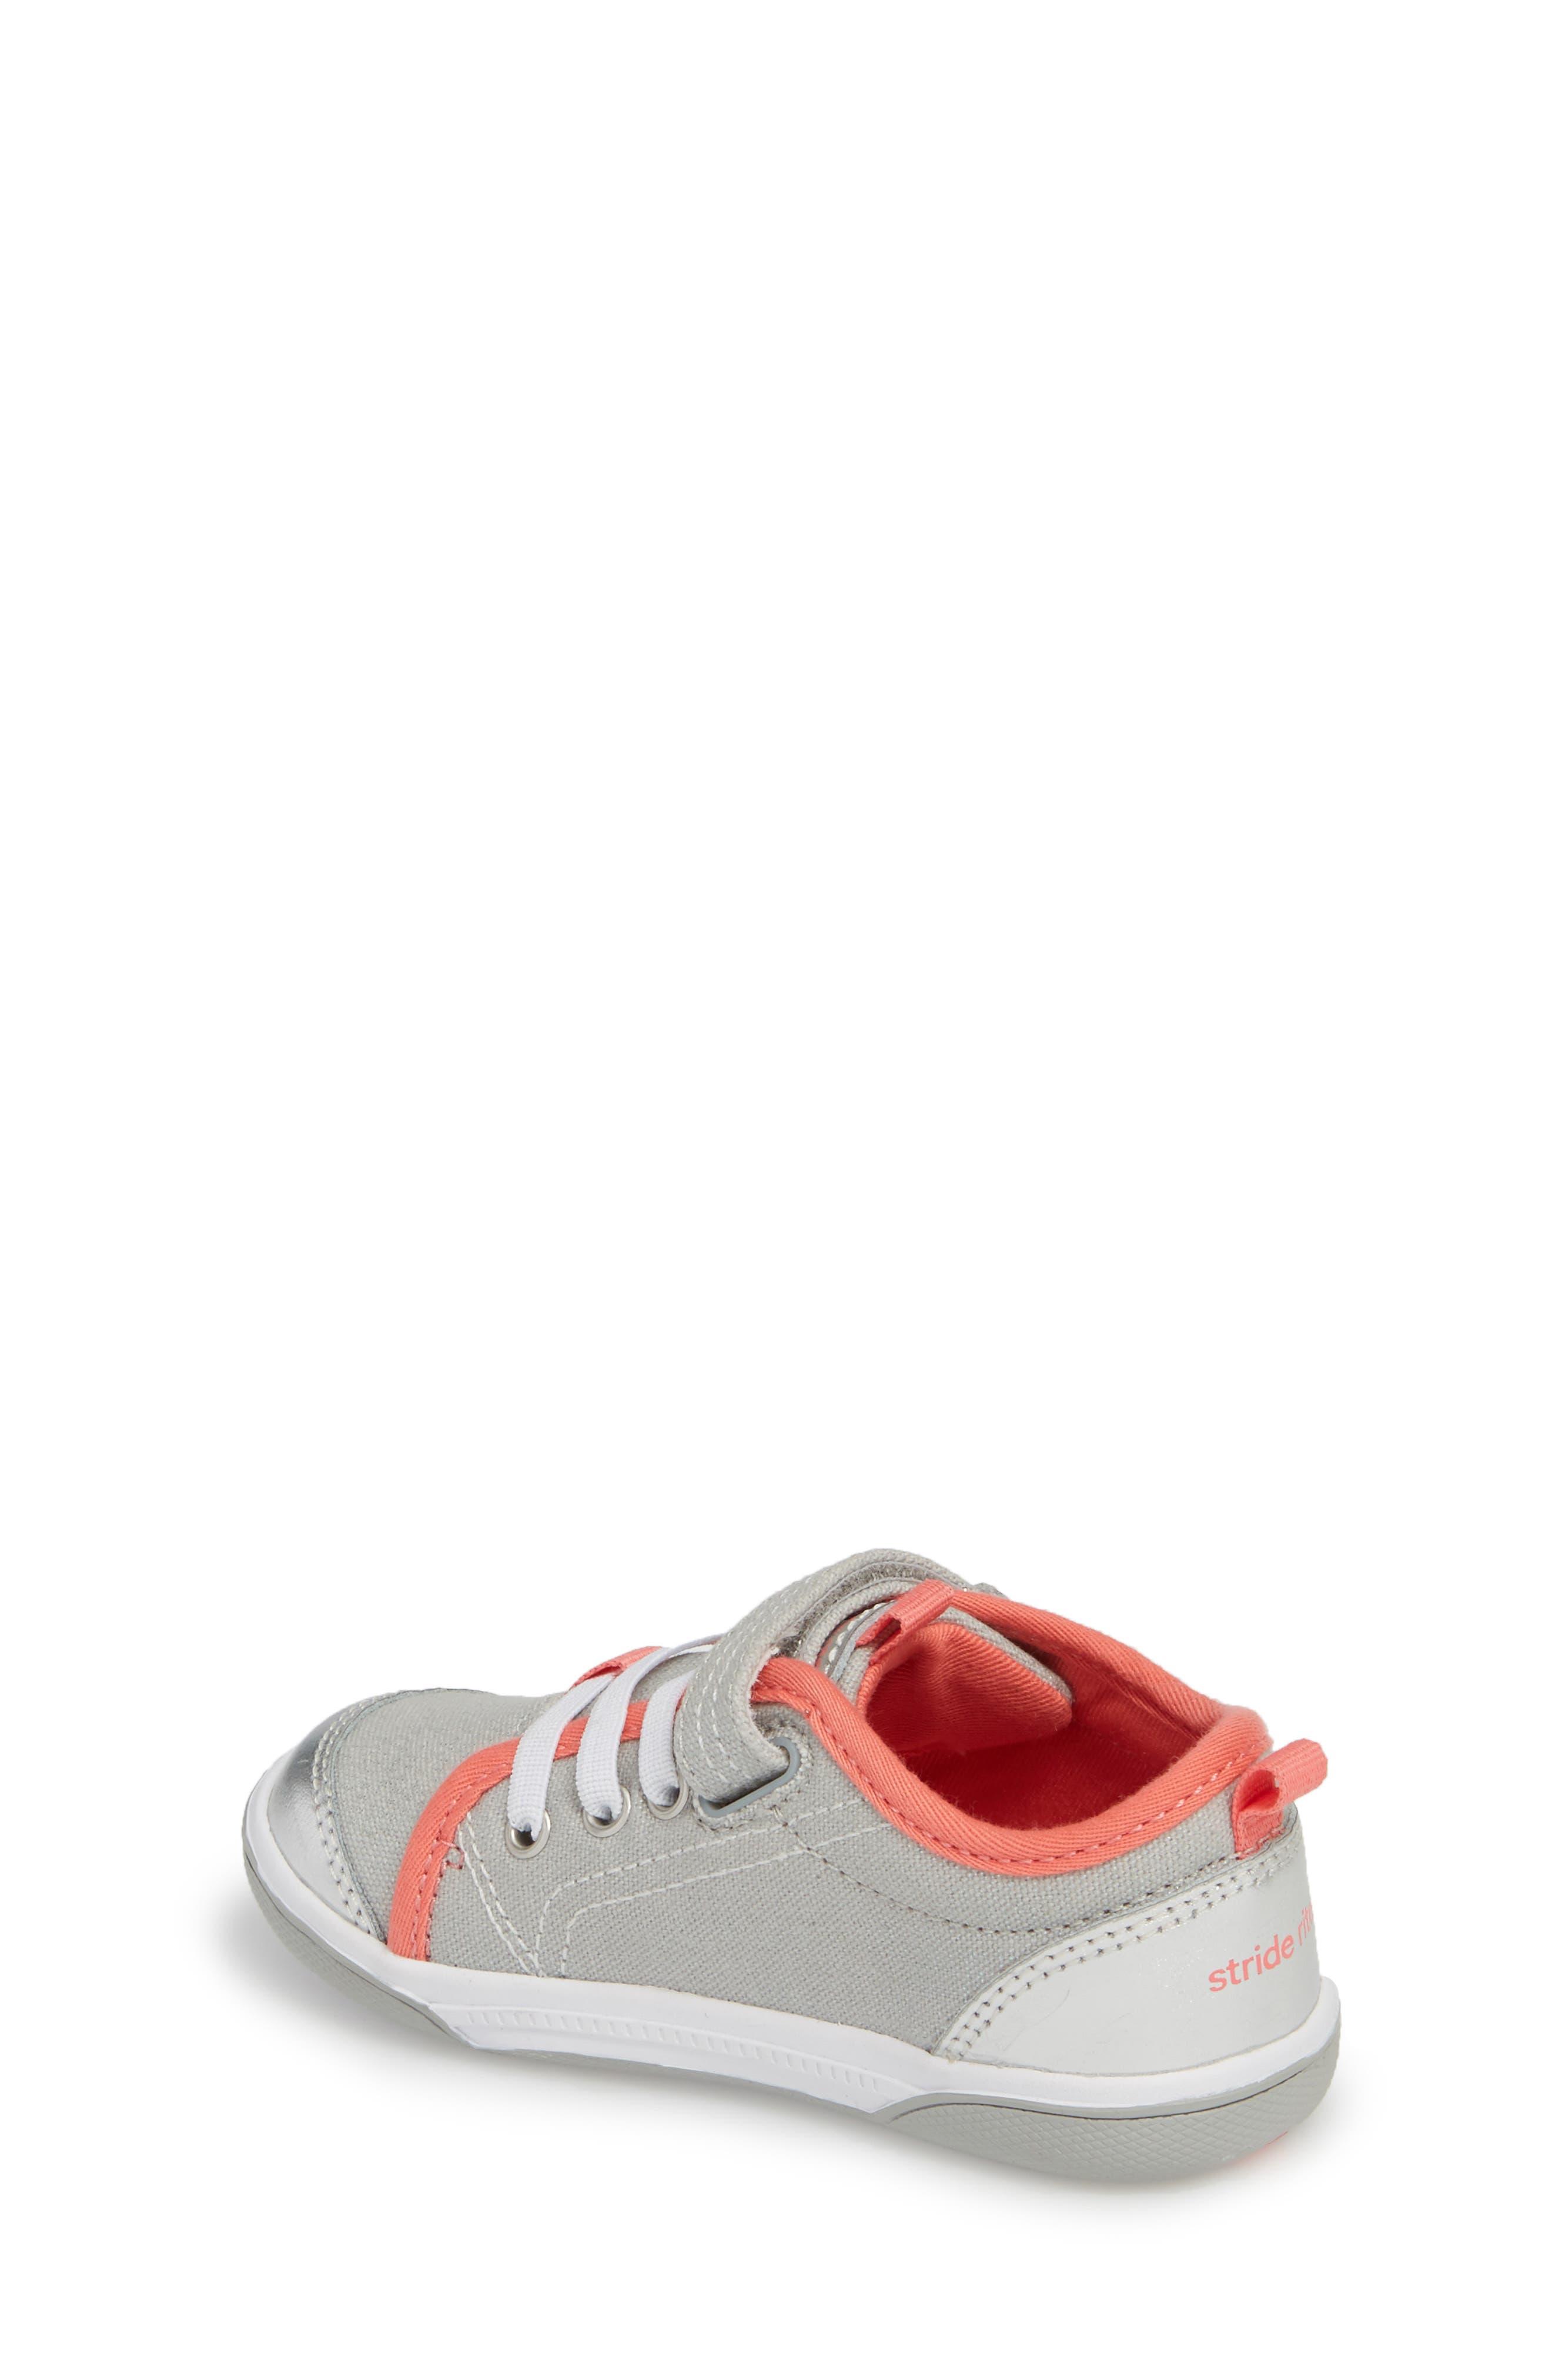 Dakota Sneaker,                             Alternate thumbnail 2, color,                             LIGHT GREY CANVAS